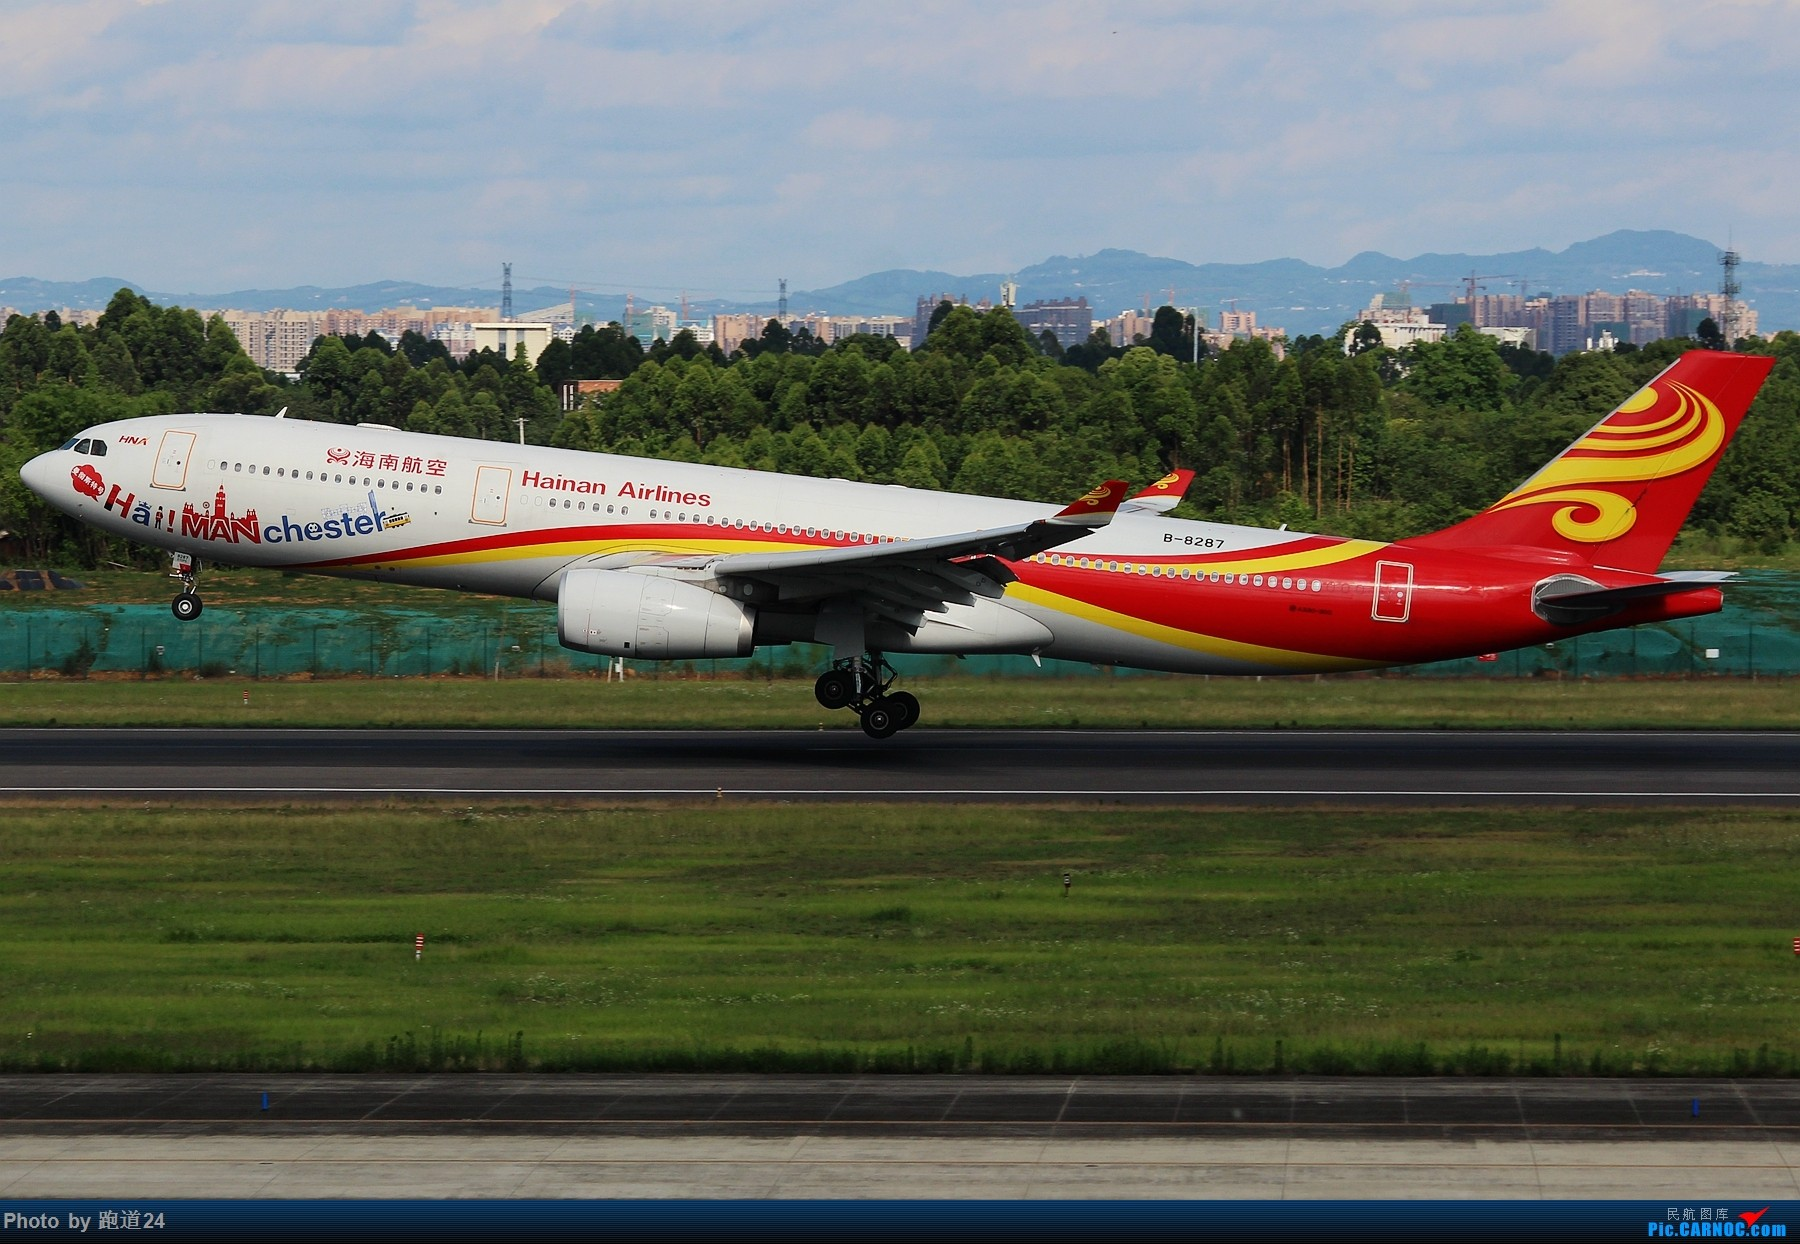 Re:[原创]【多图党】6月18日成都拍机【埃塞俄比亚航空B777-200LR】 AIRBUS A330-300 B-8287 中国成都双流国际机场